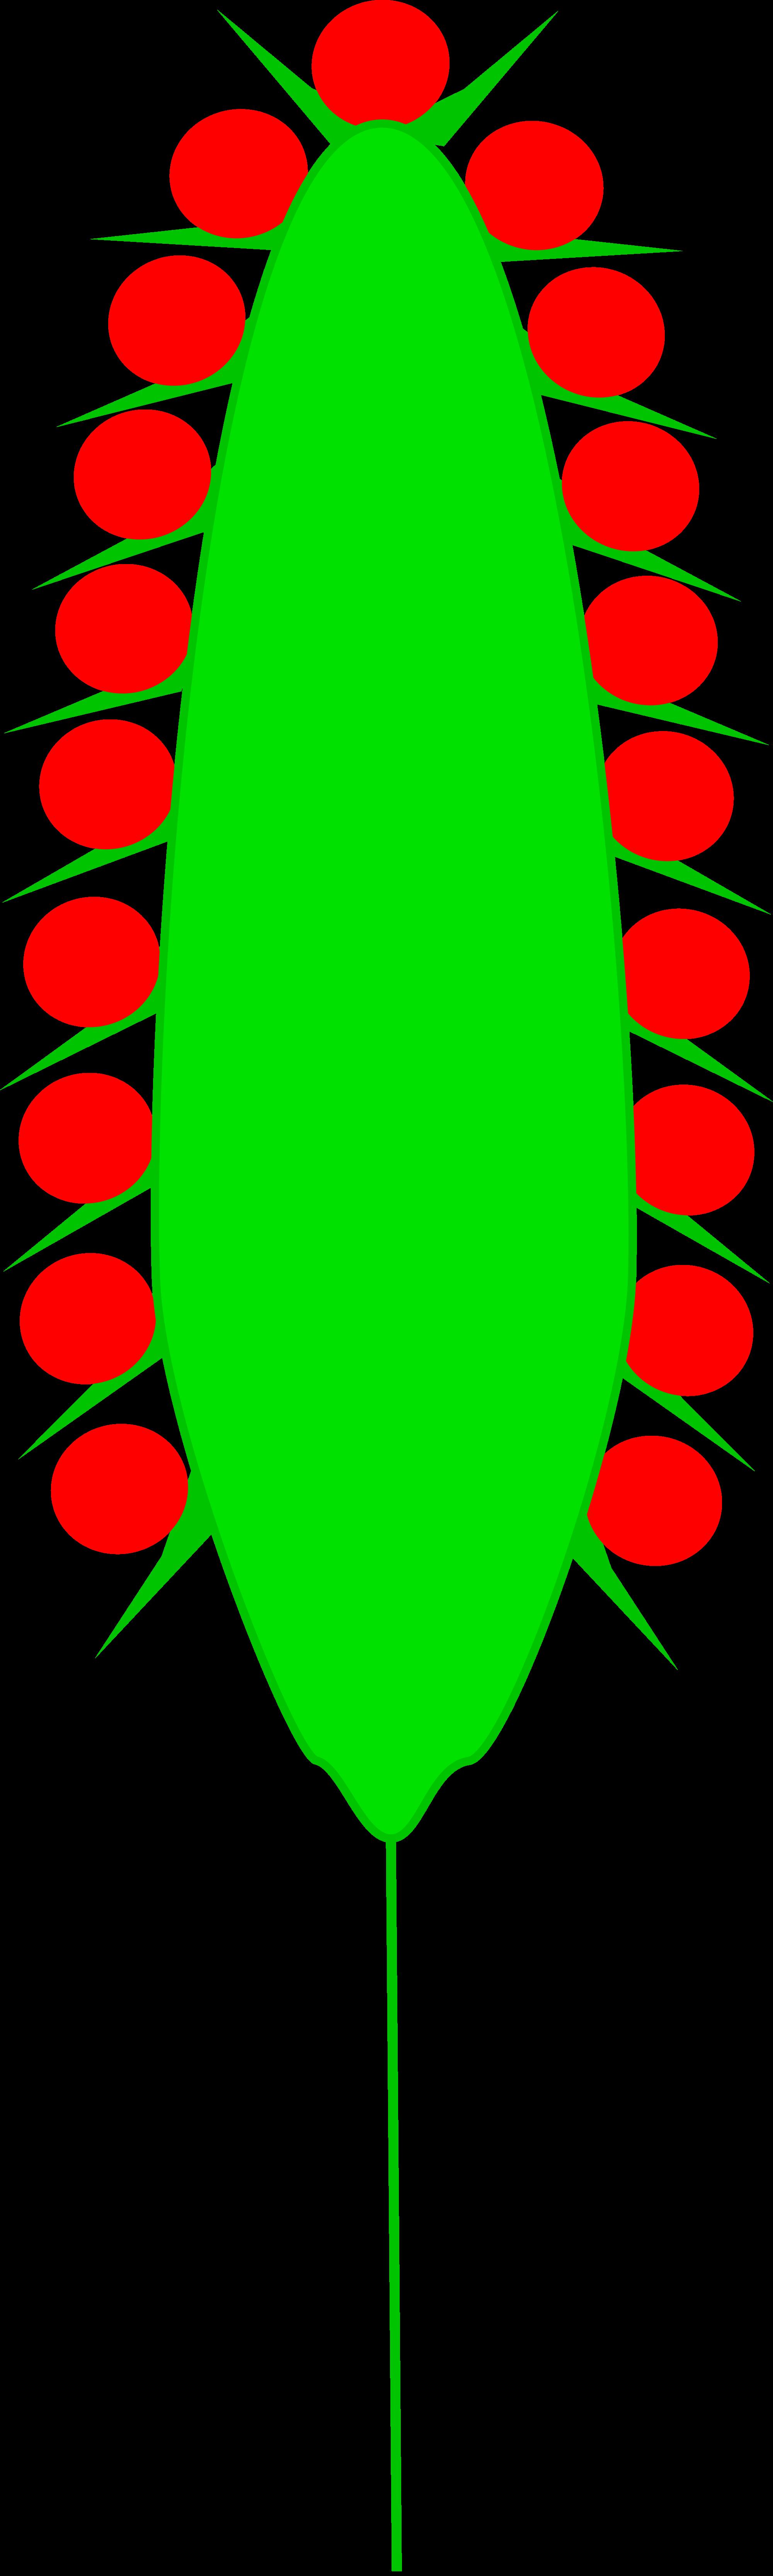 File:Inflorescences Spadix Kwiatostan Kolba.svg.